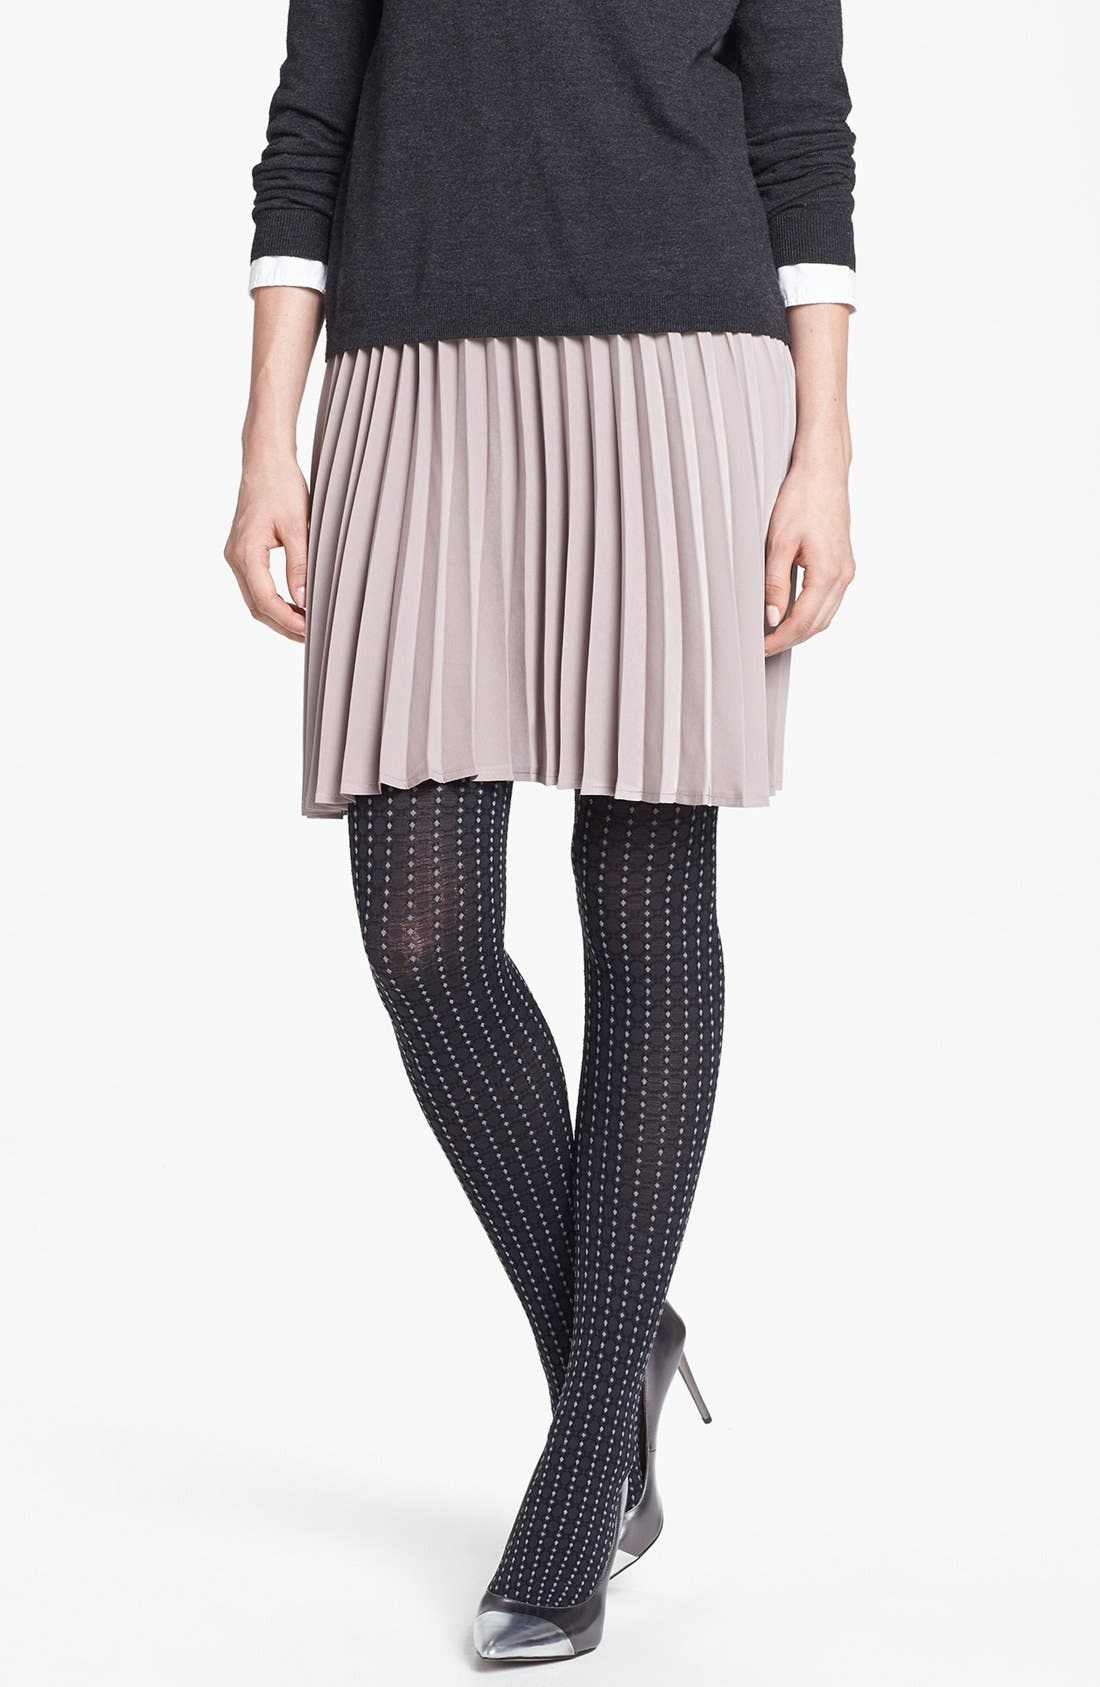 Alternate Image 1 Selected - DKNY 'Menswear Foulard' Tights